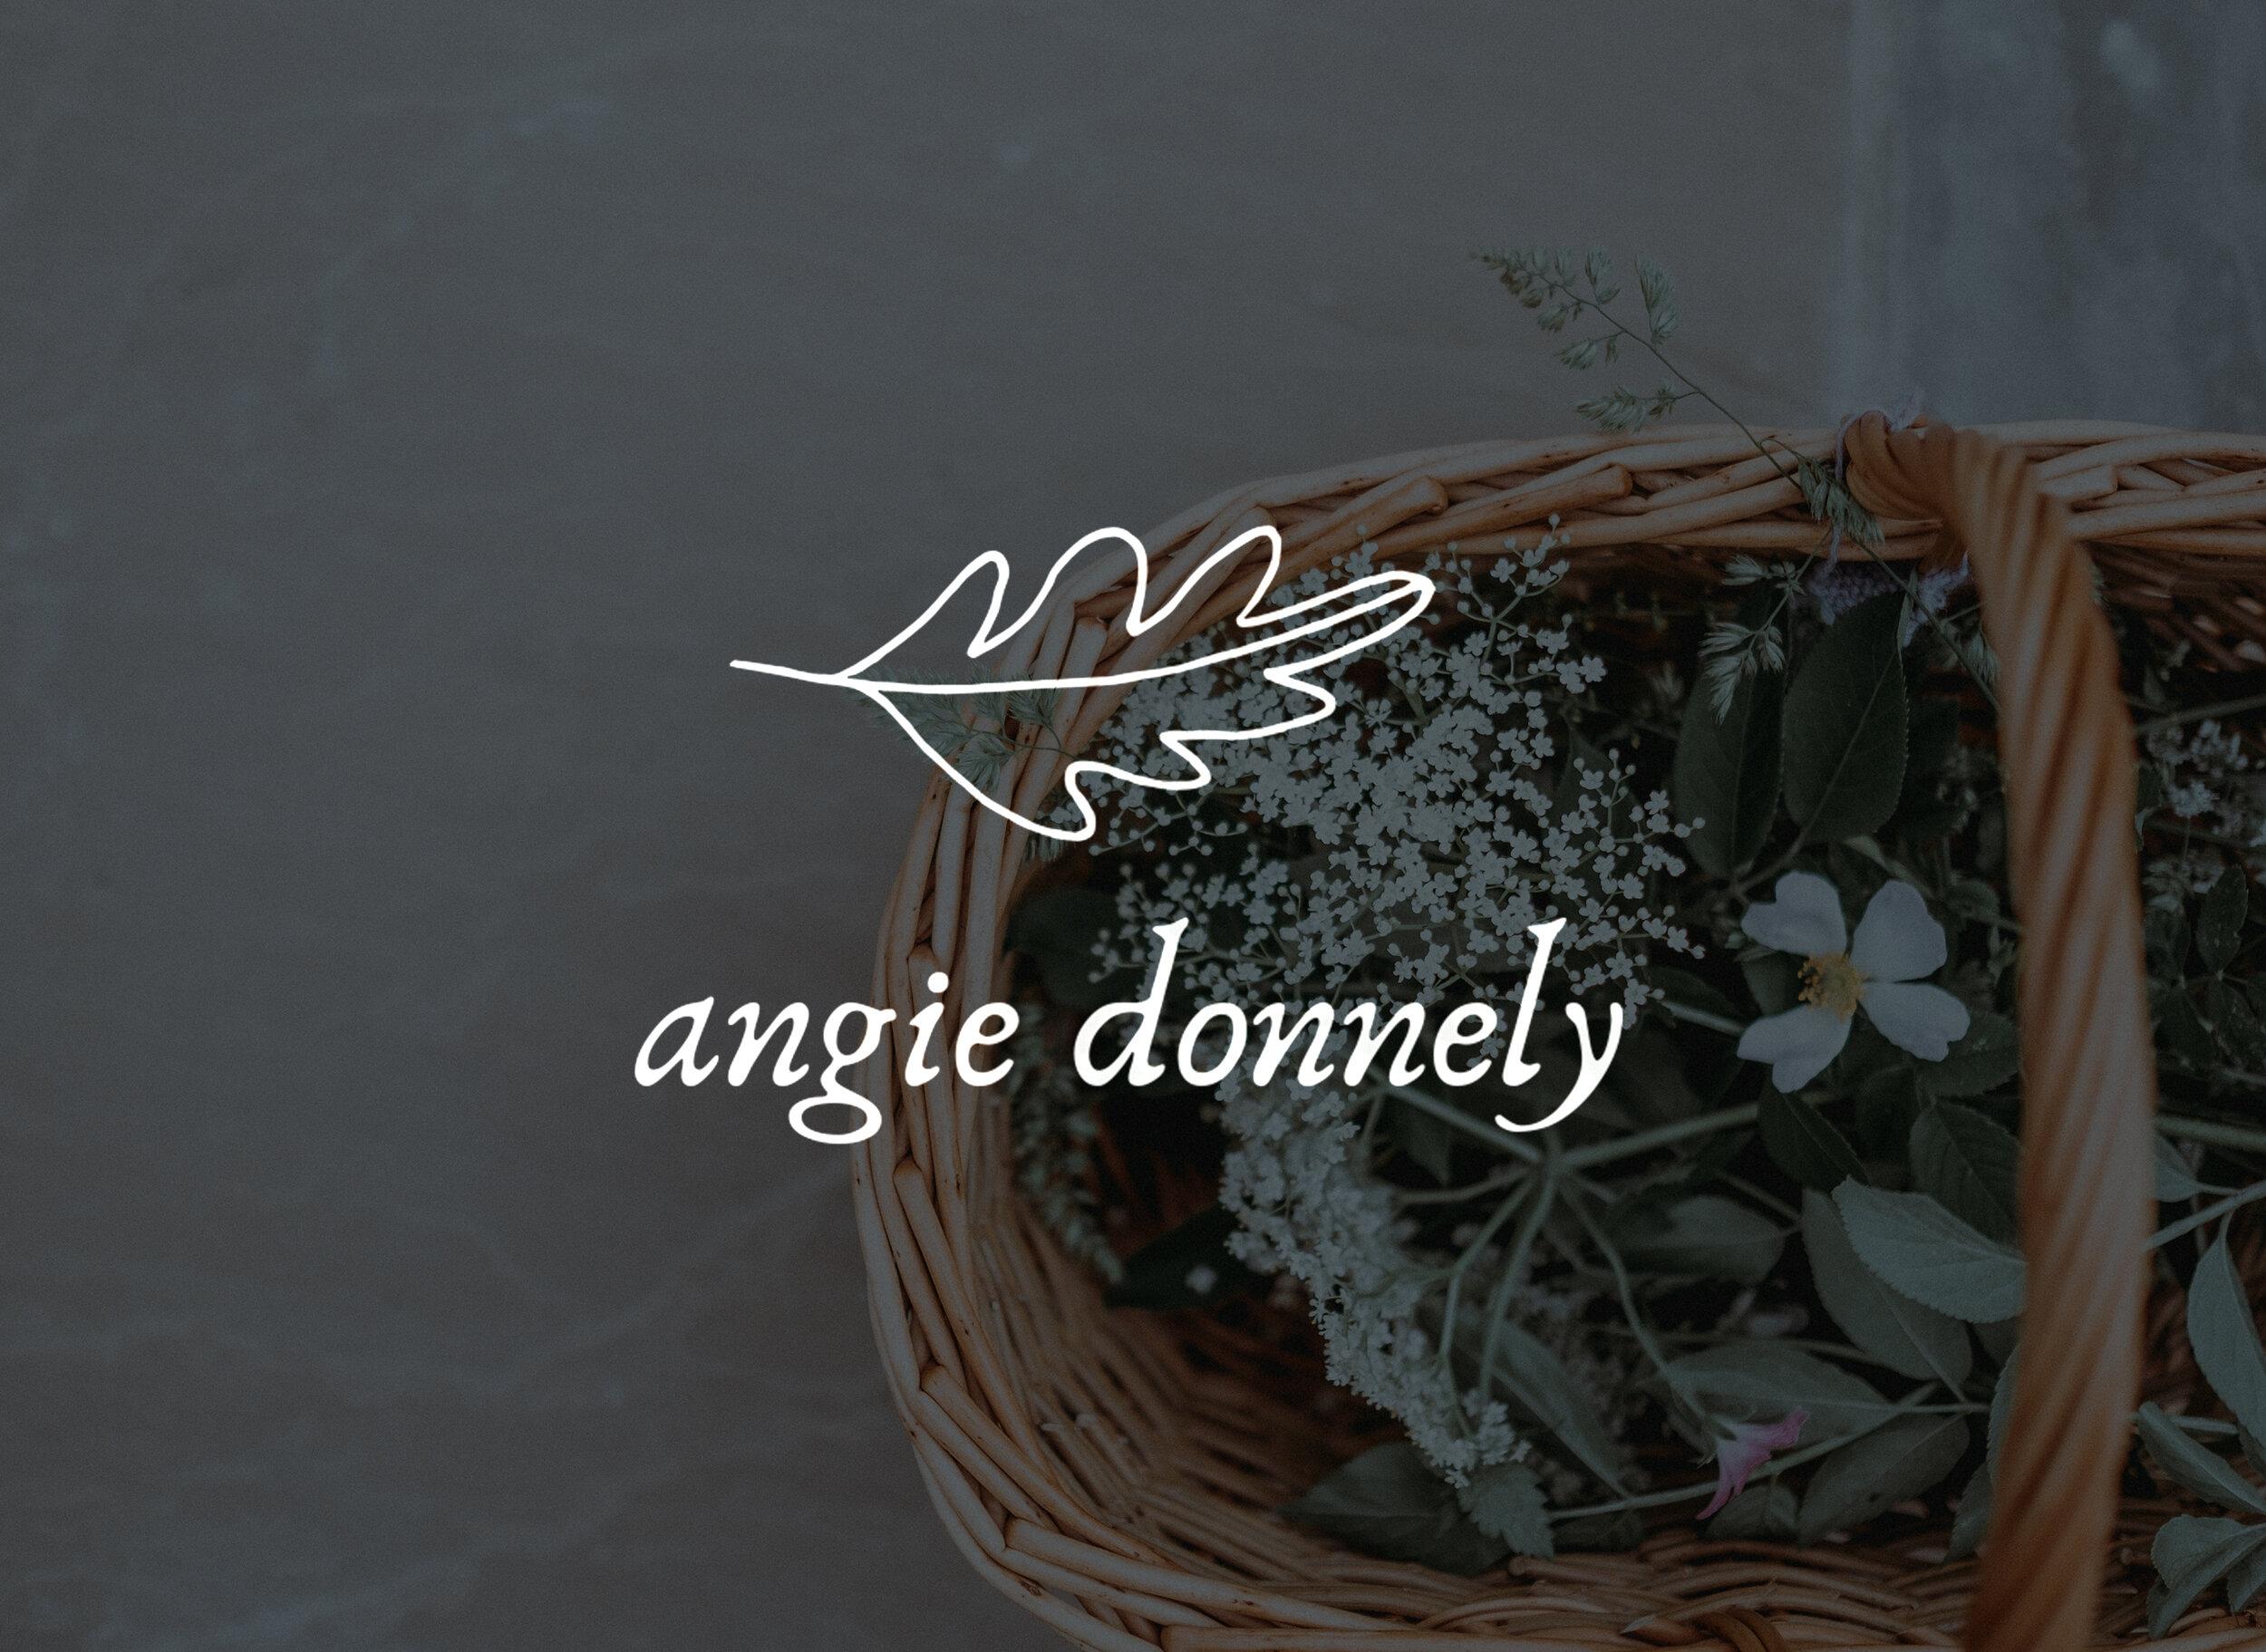 5-diy-logo-1.jpg